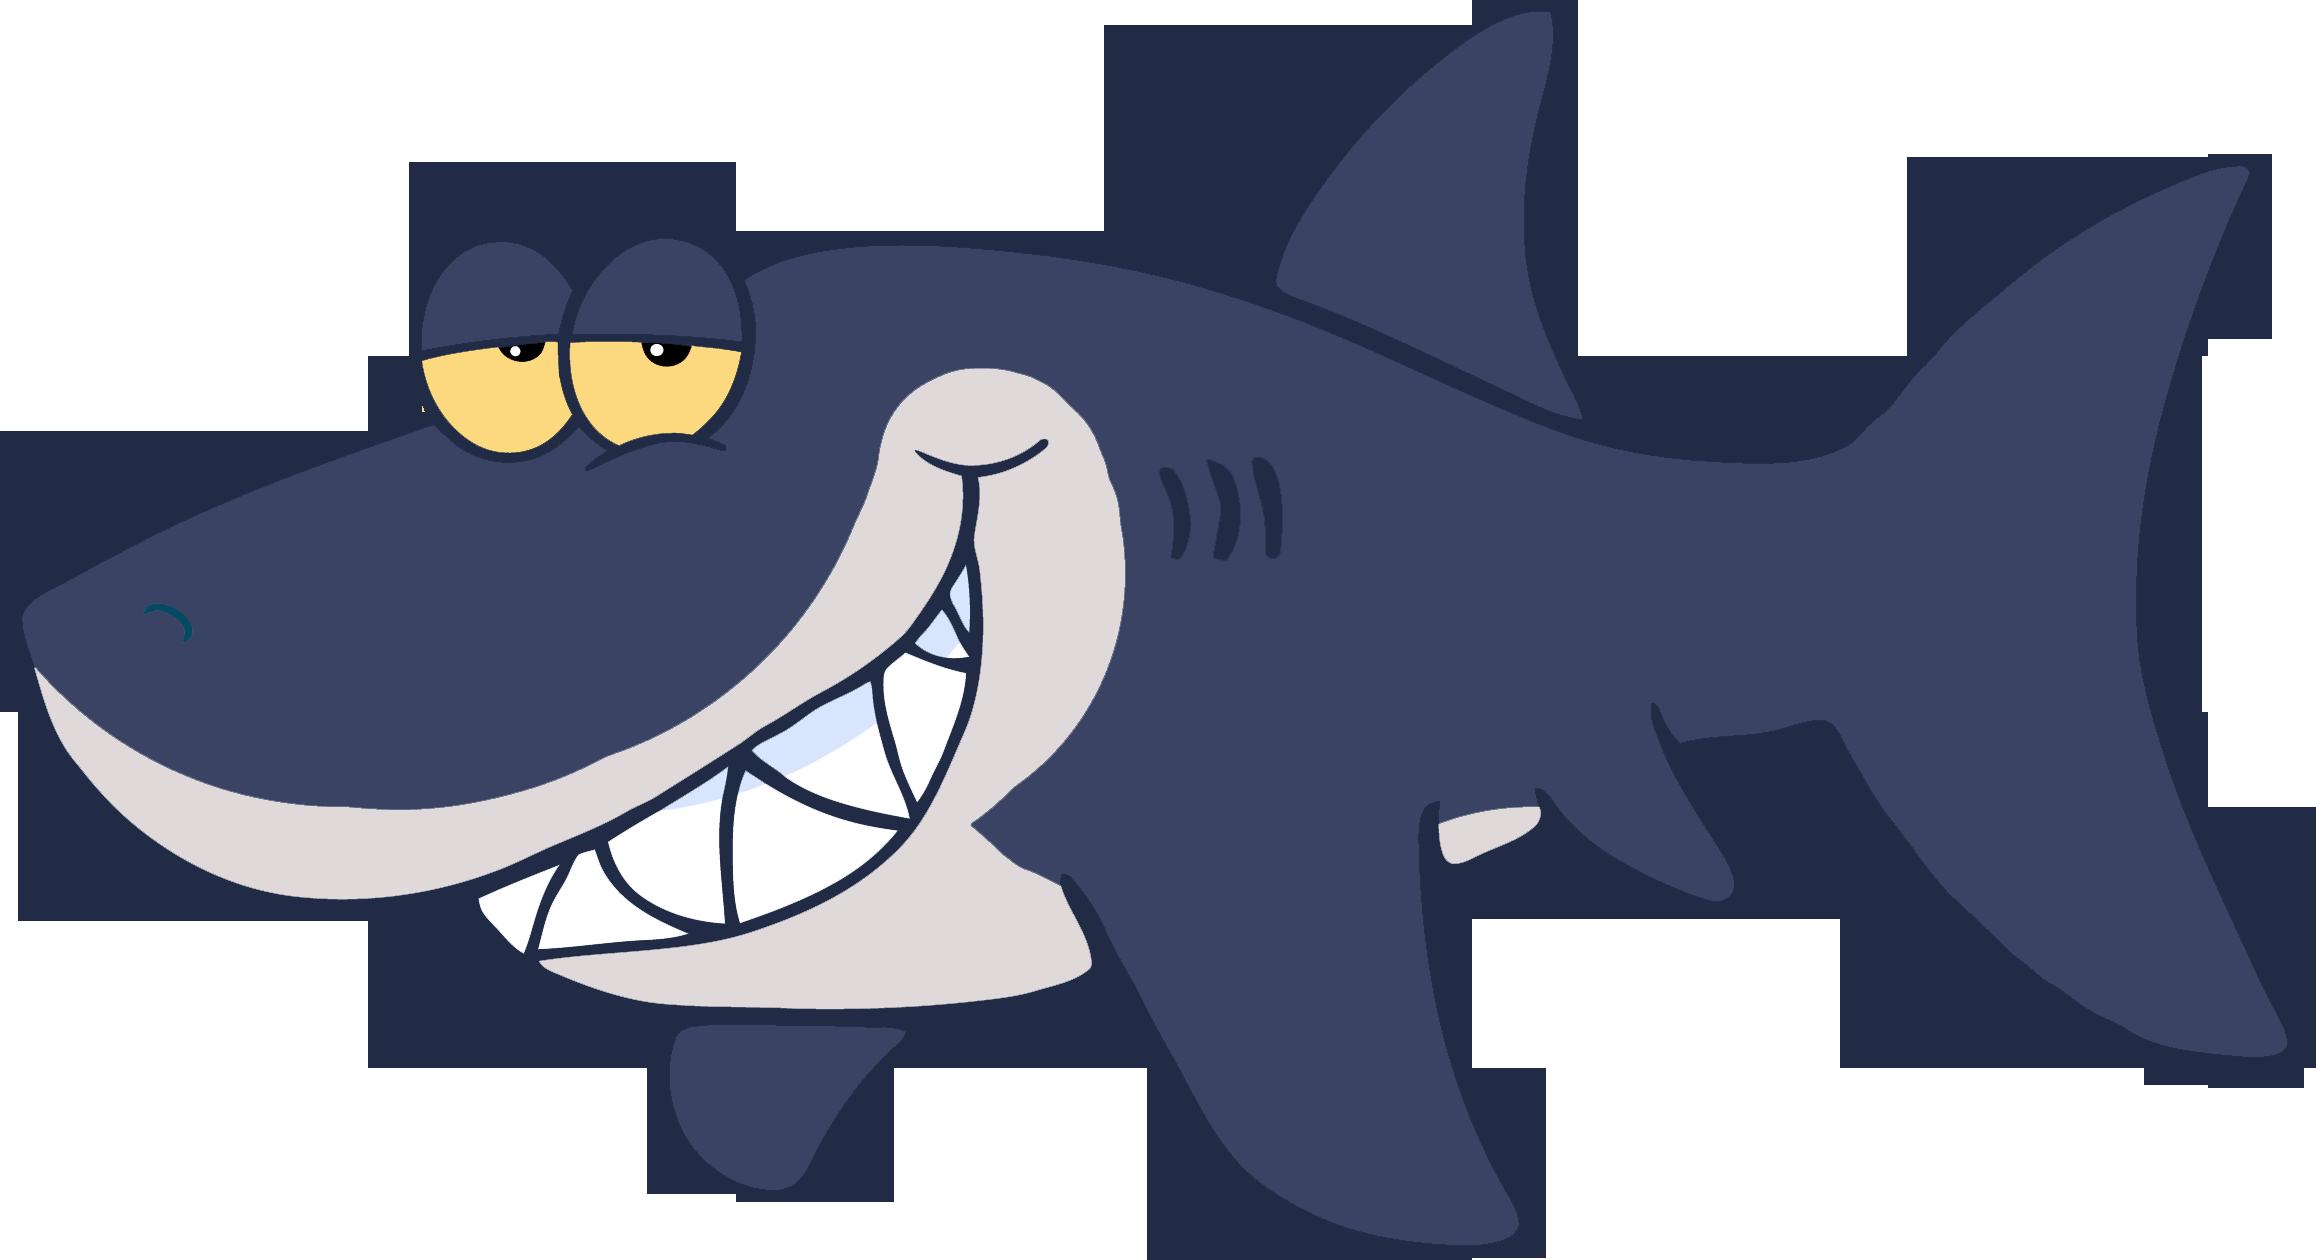 Fish tail fin clipart image royalty free library Shark Cartoon Royalty-free Clip art - shark 2316*1260 transprent Png ... image royalty free library